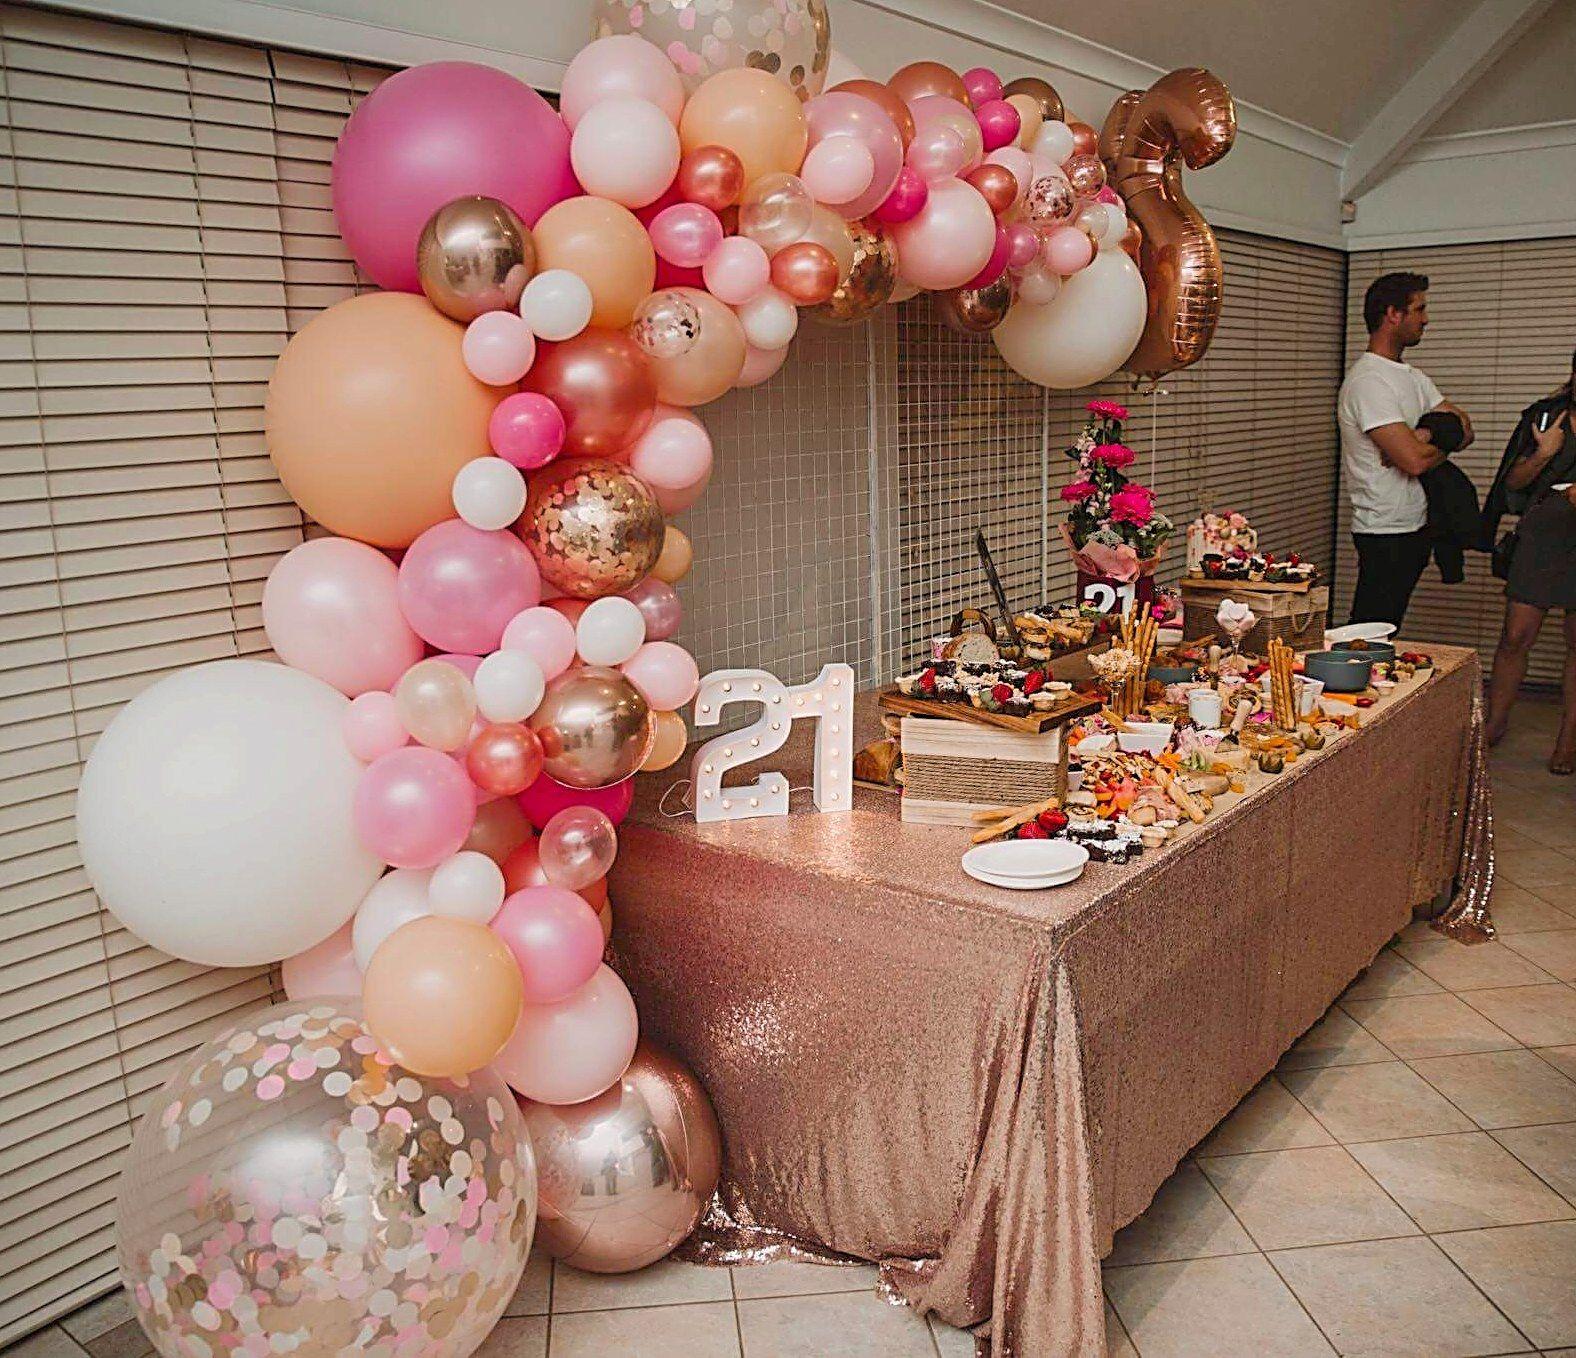 21st Birthday Dessert Table And Balloon Backdrop By Stylish Soirees Perth Balloongarlan Dessert Table Birthday 21st Birthday Decorations 21st Birthday Dessert